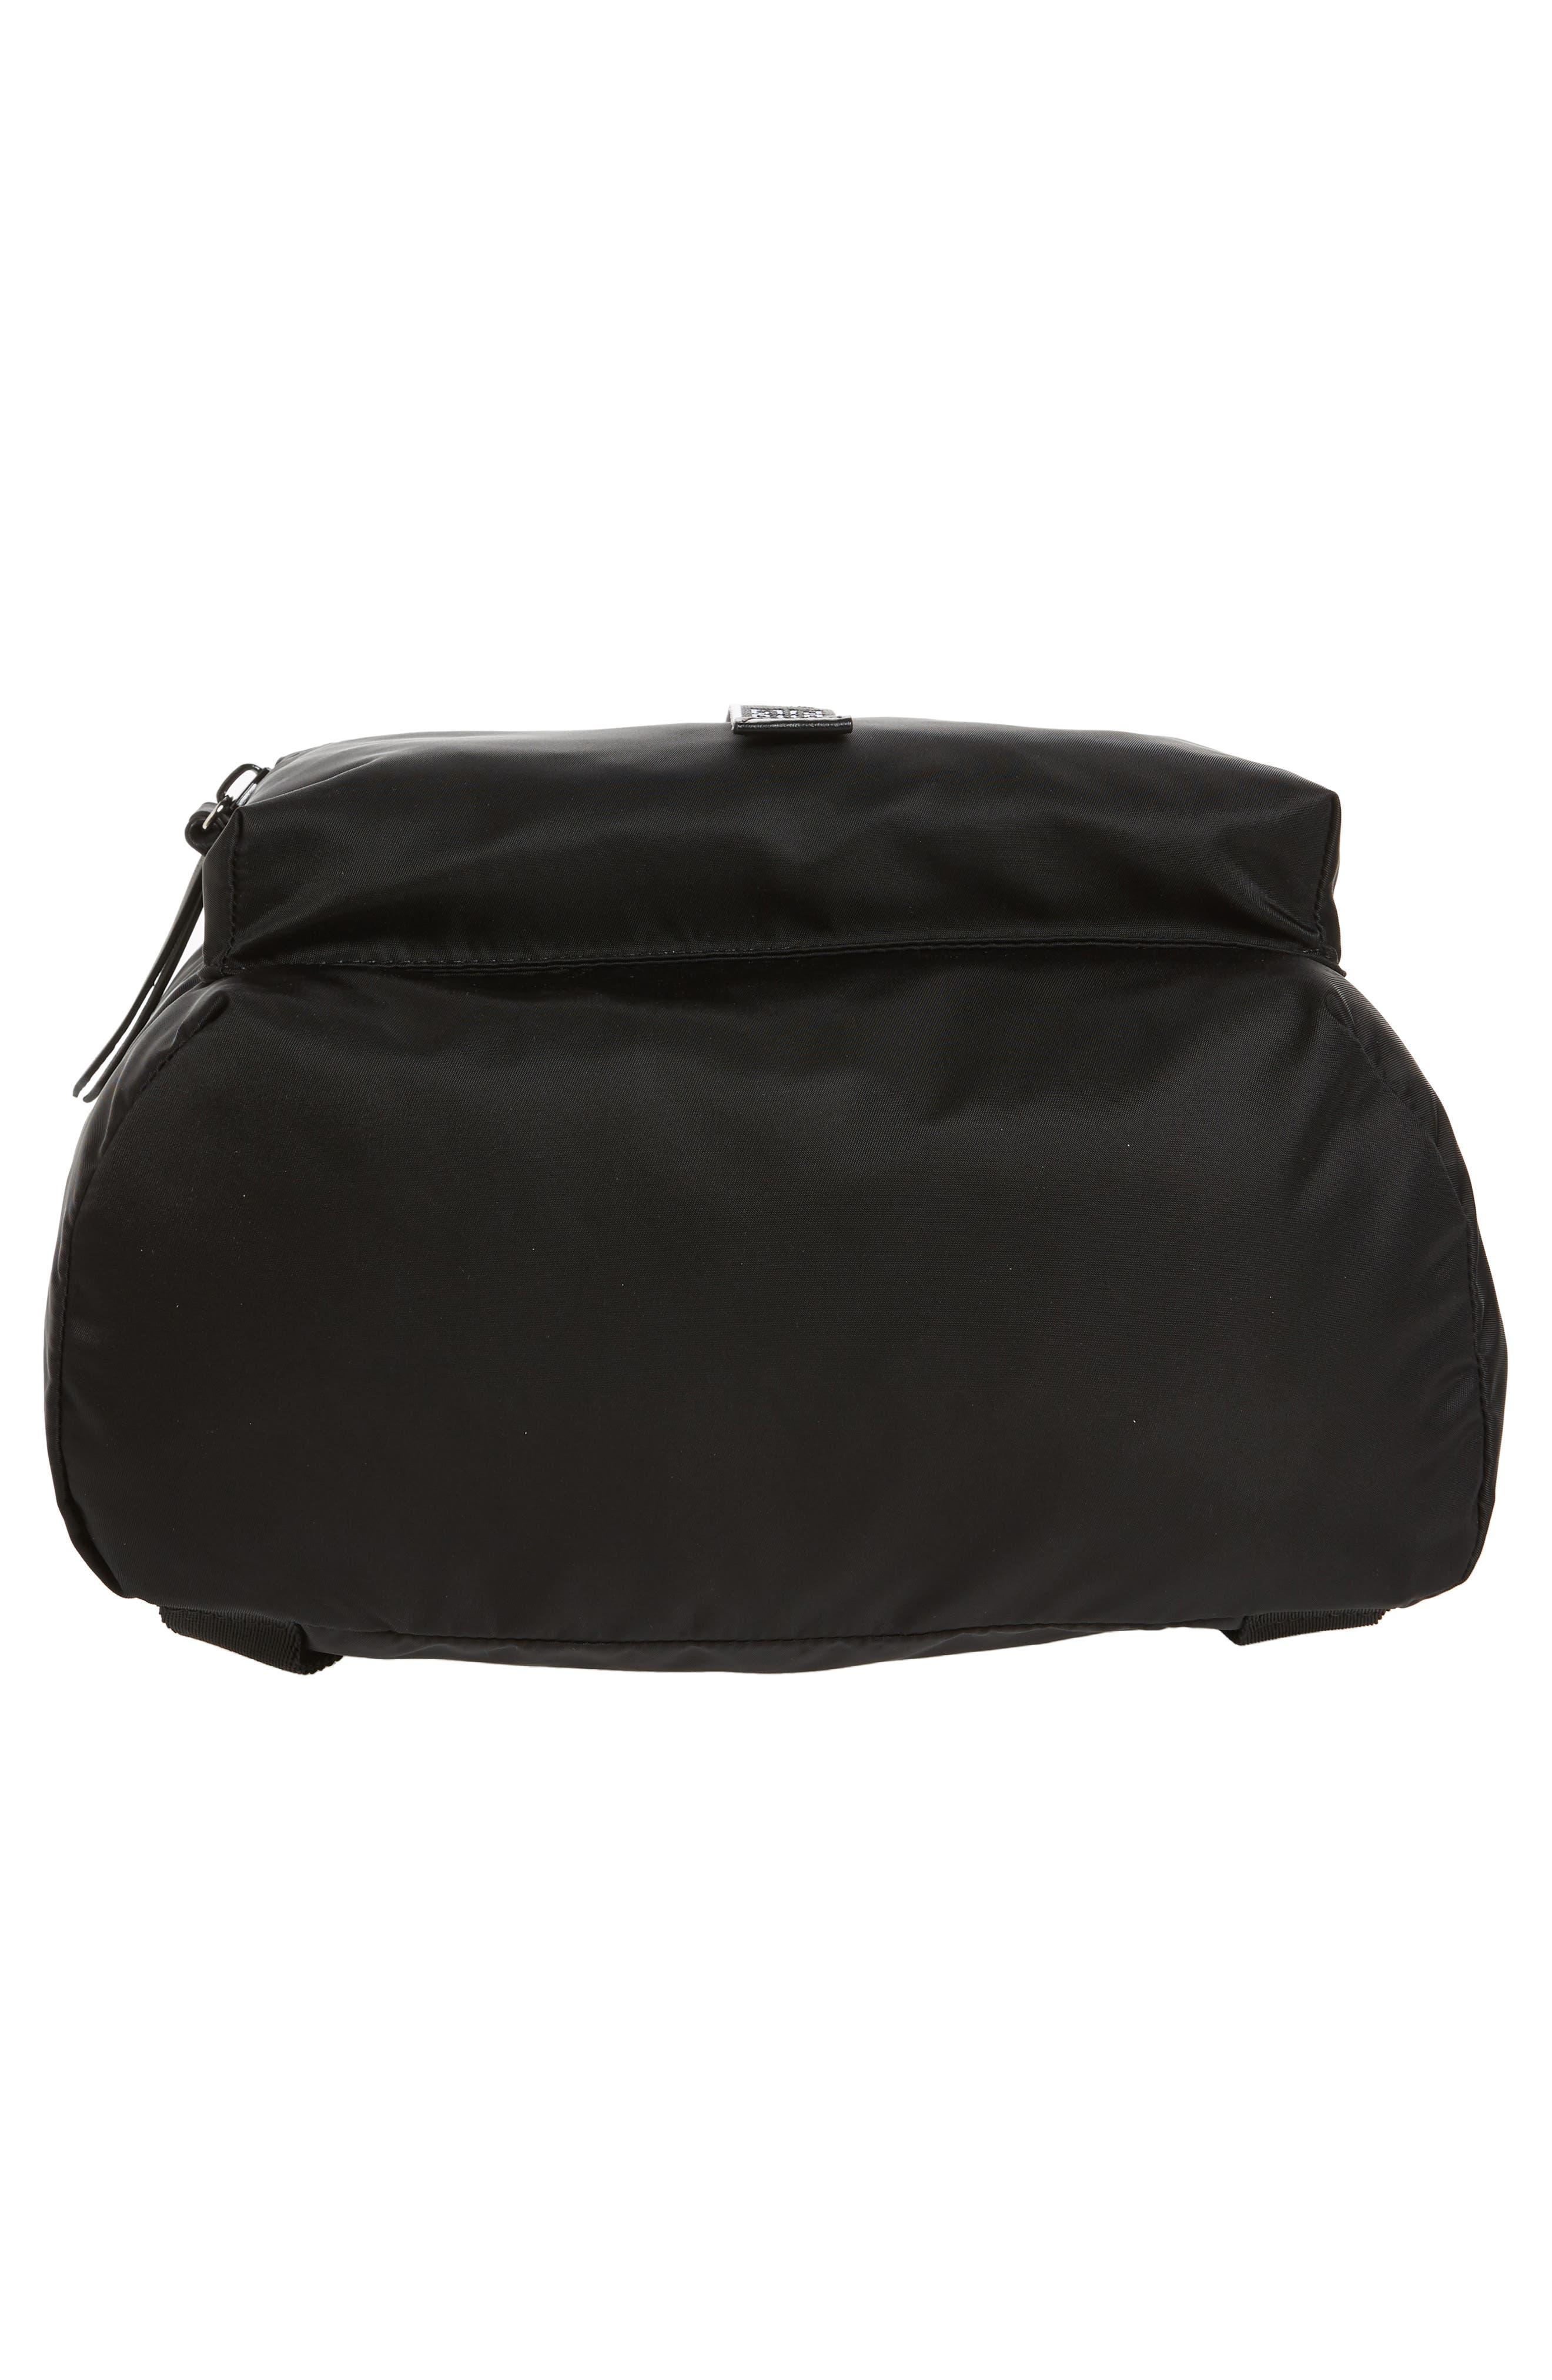 GIVENCHY, Light 3 Backpack, Alternate thumbnail 6, color, BLACK/ WHITE